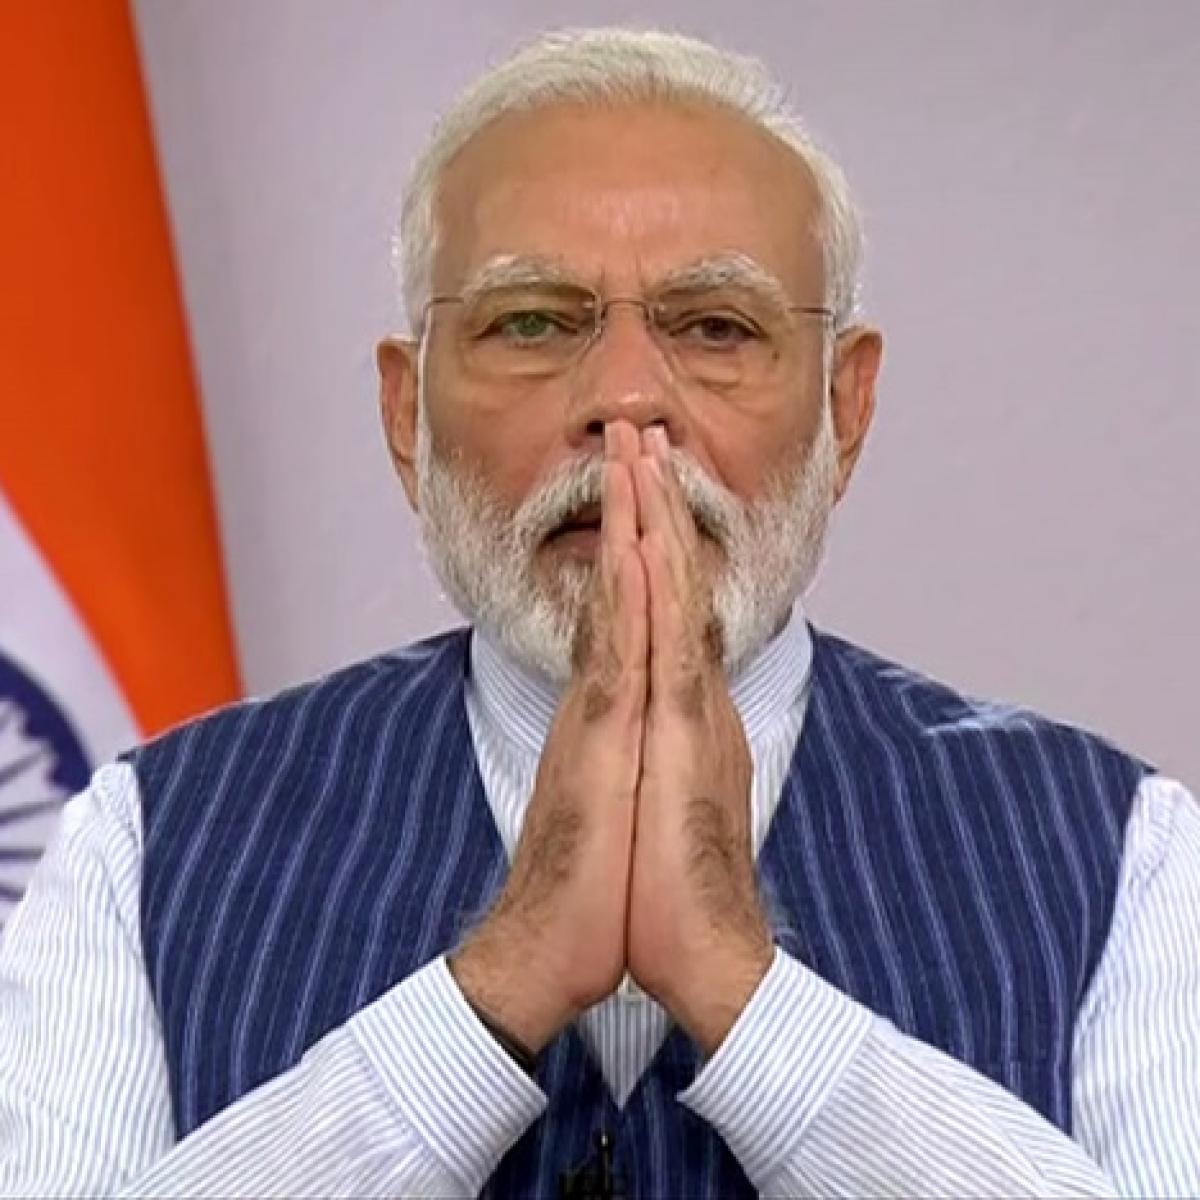 PM Modi to address nation through Mann Ki Baat tomorrow; here's how to watch